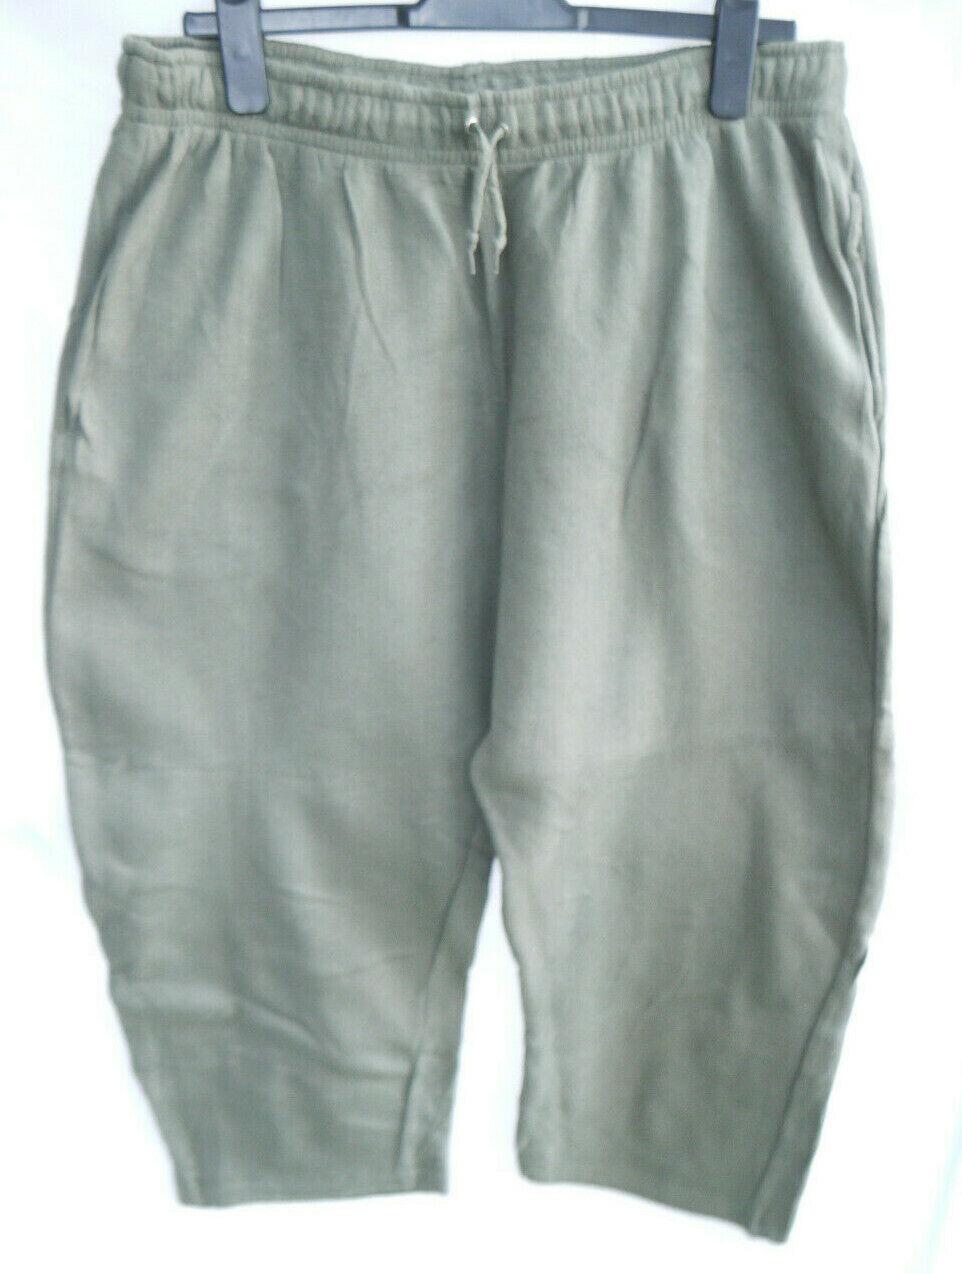 Cs Active Casual Joggers Green Cotton Elastic Tie Waist Pants Size XXL, Free P&P